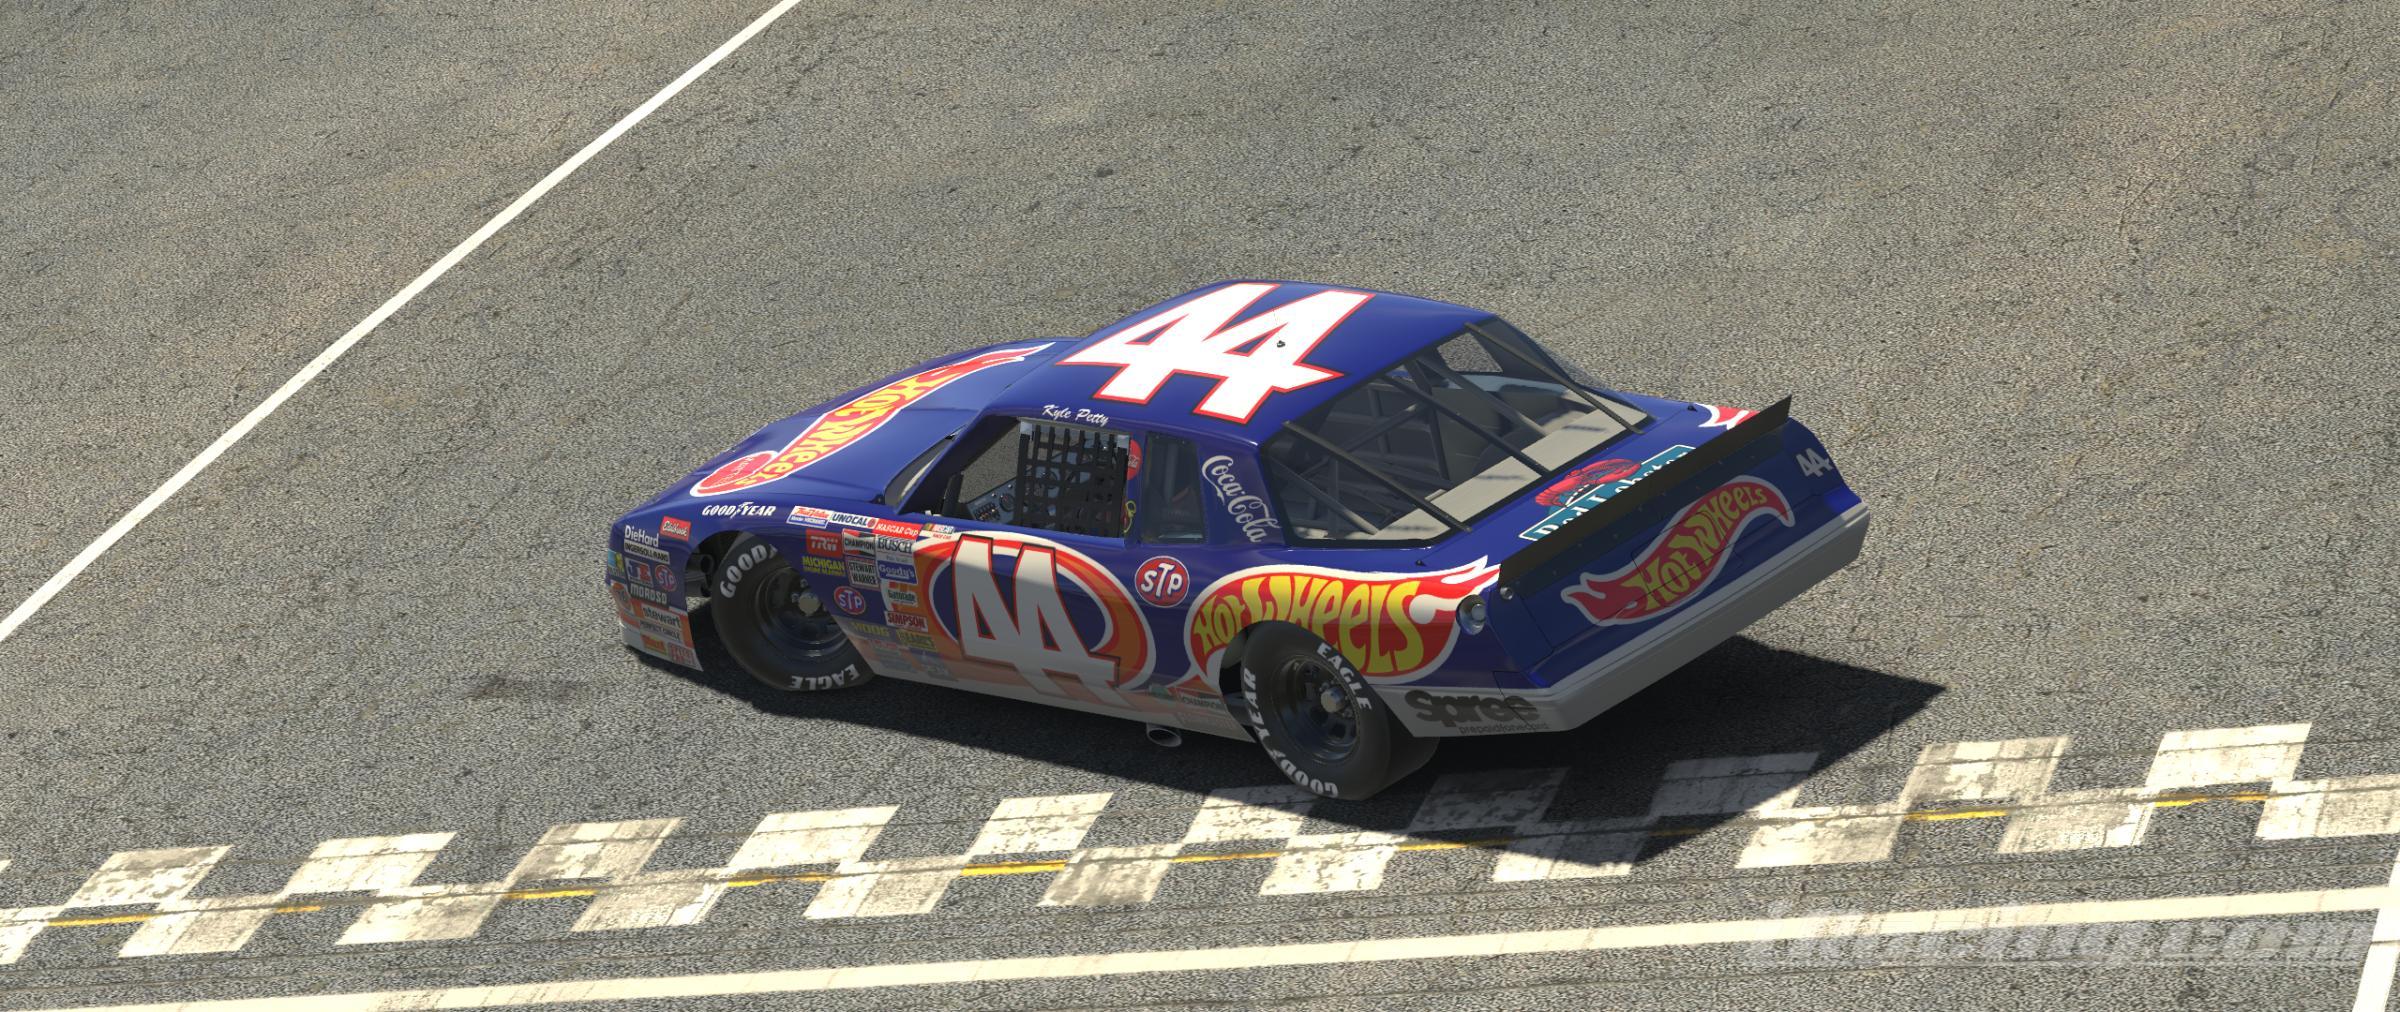 Preview of Kyle Petty 1998 Hot Wheels Grand Prix by Evan Pienta